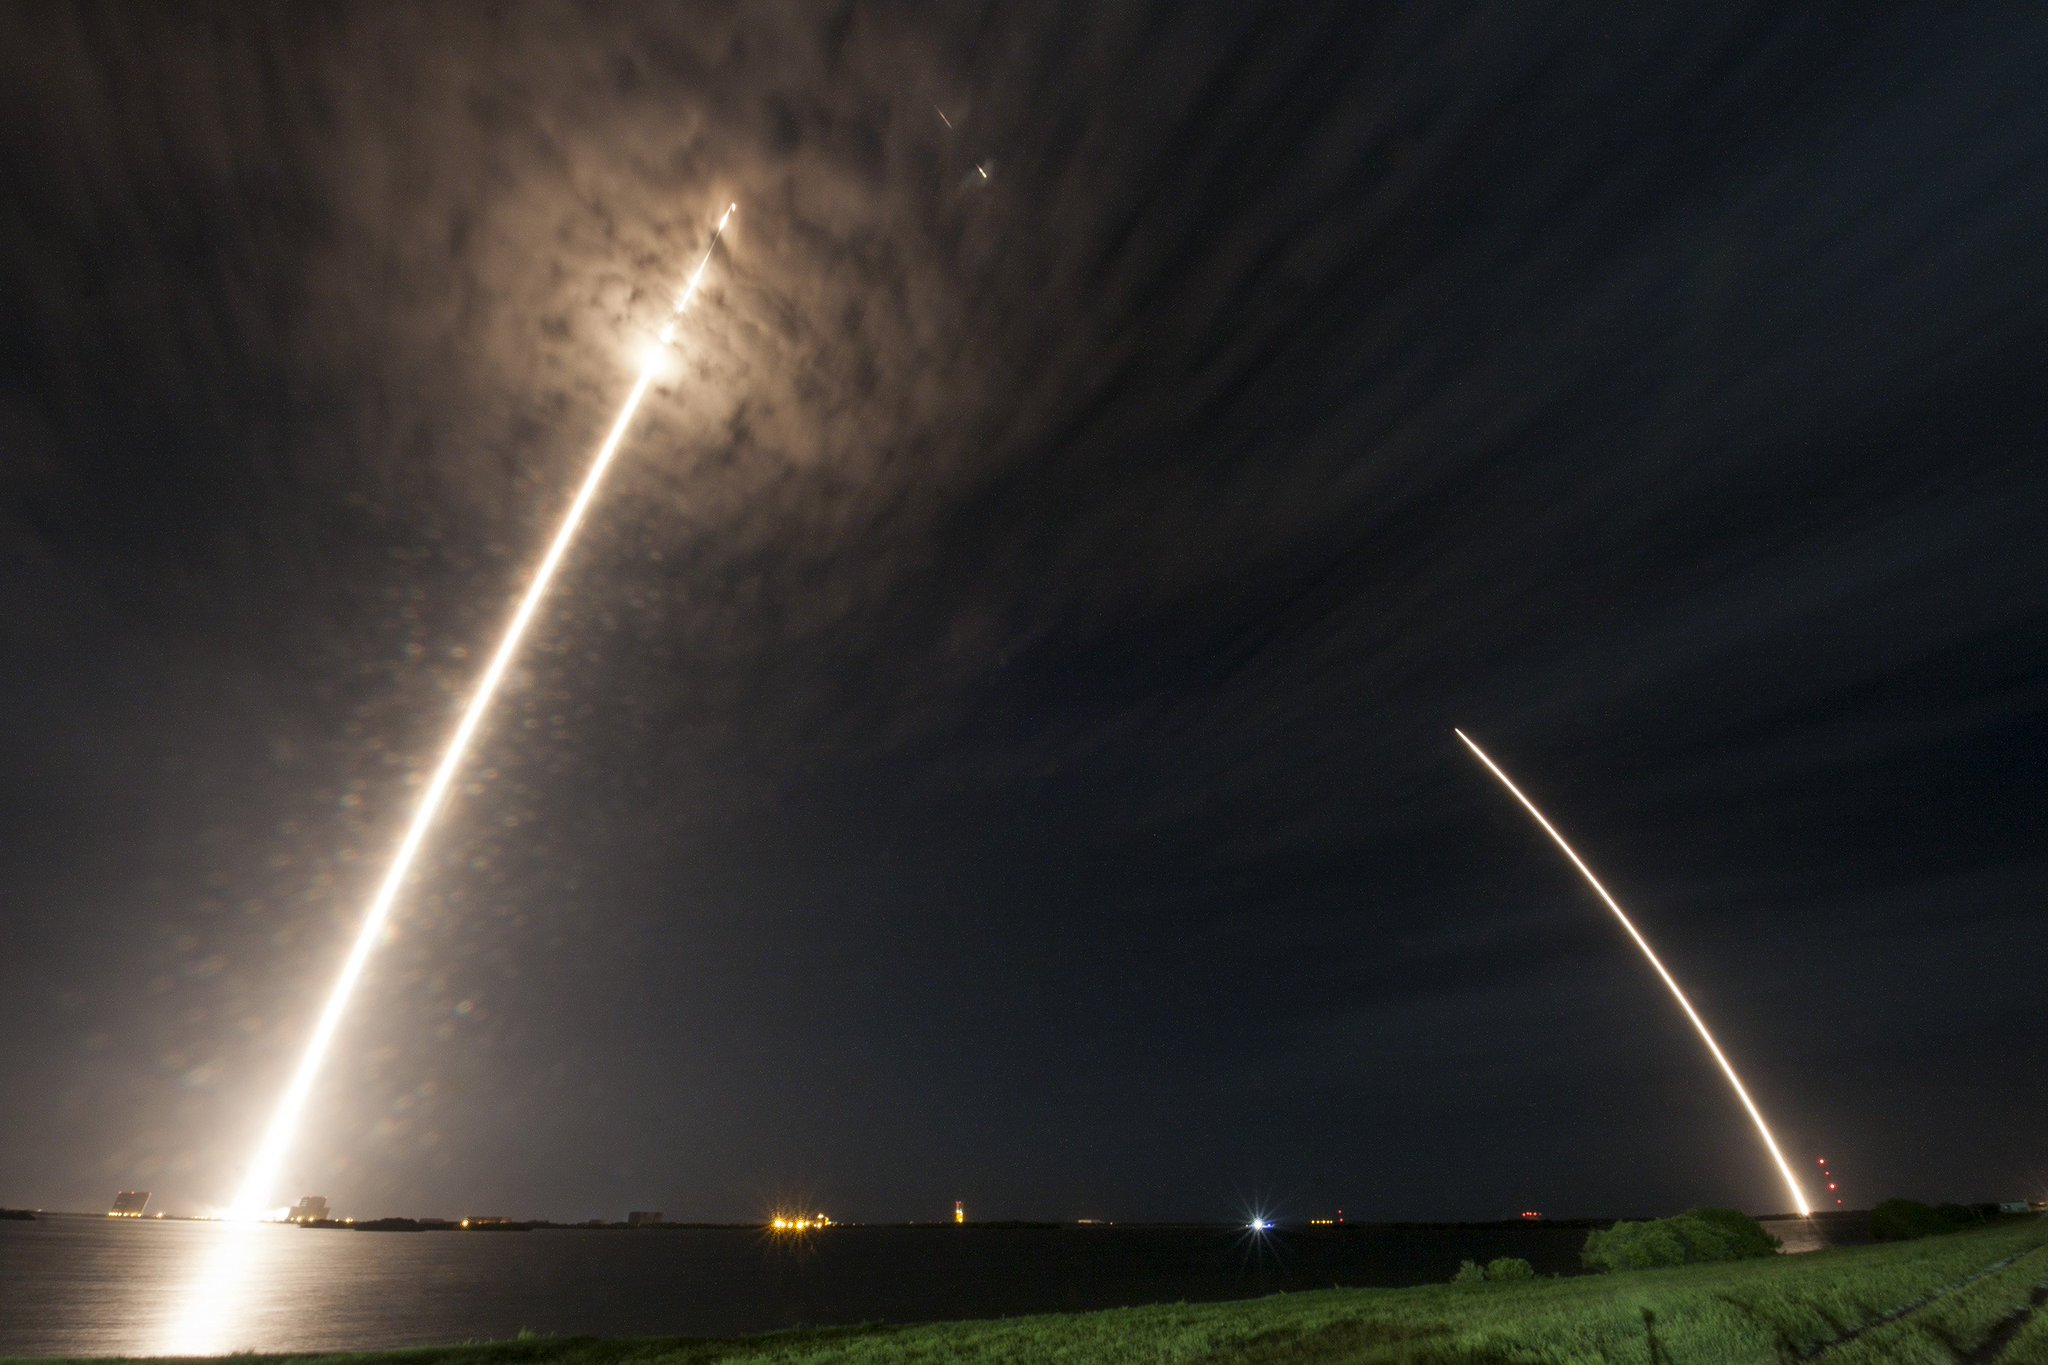 Lancement Falcon 9 / CRS-9 le 18 juillet 2016 CCAFS - Page 2 Cnn13axVYAAt1UV